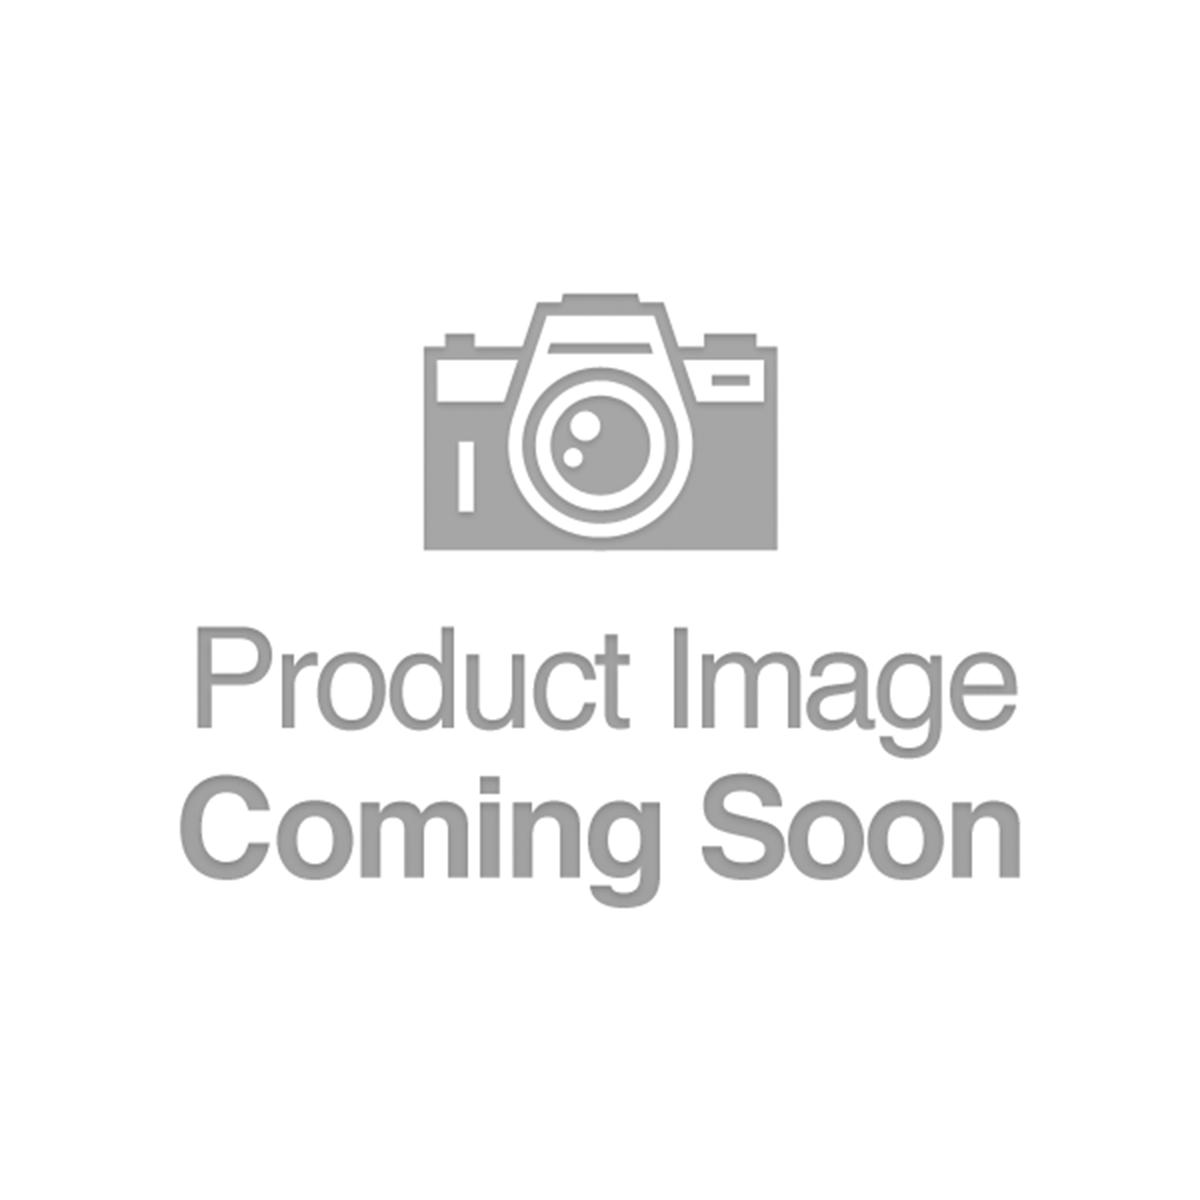 FR. 1705*  $10  1934D  Silver Certificate  PMG 64 EPQ